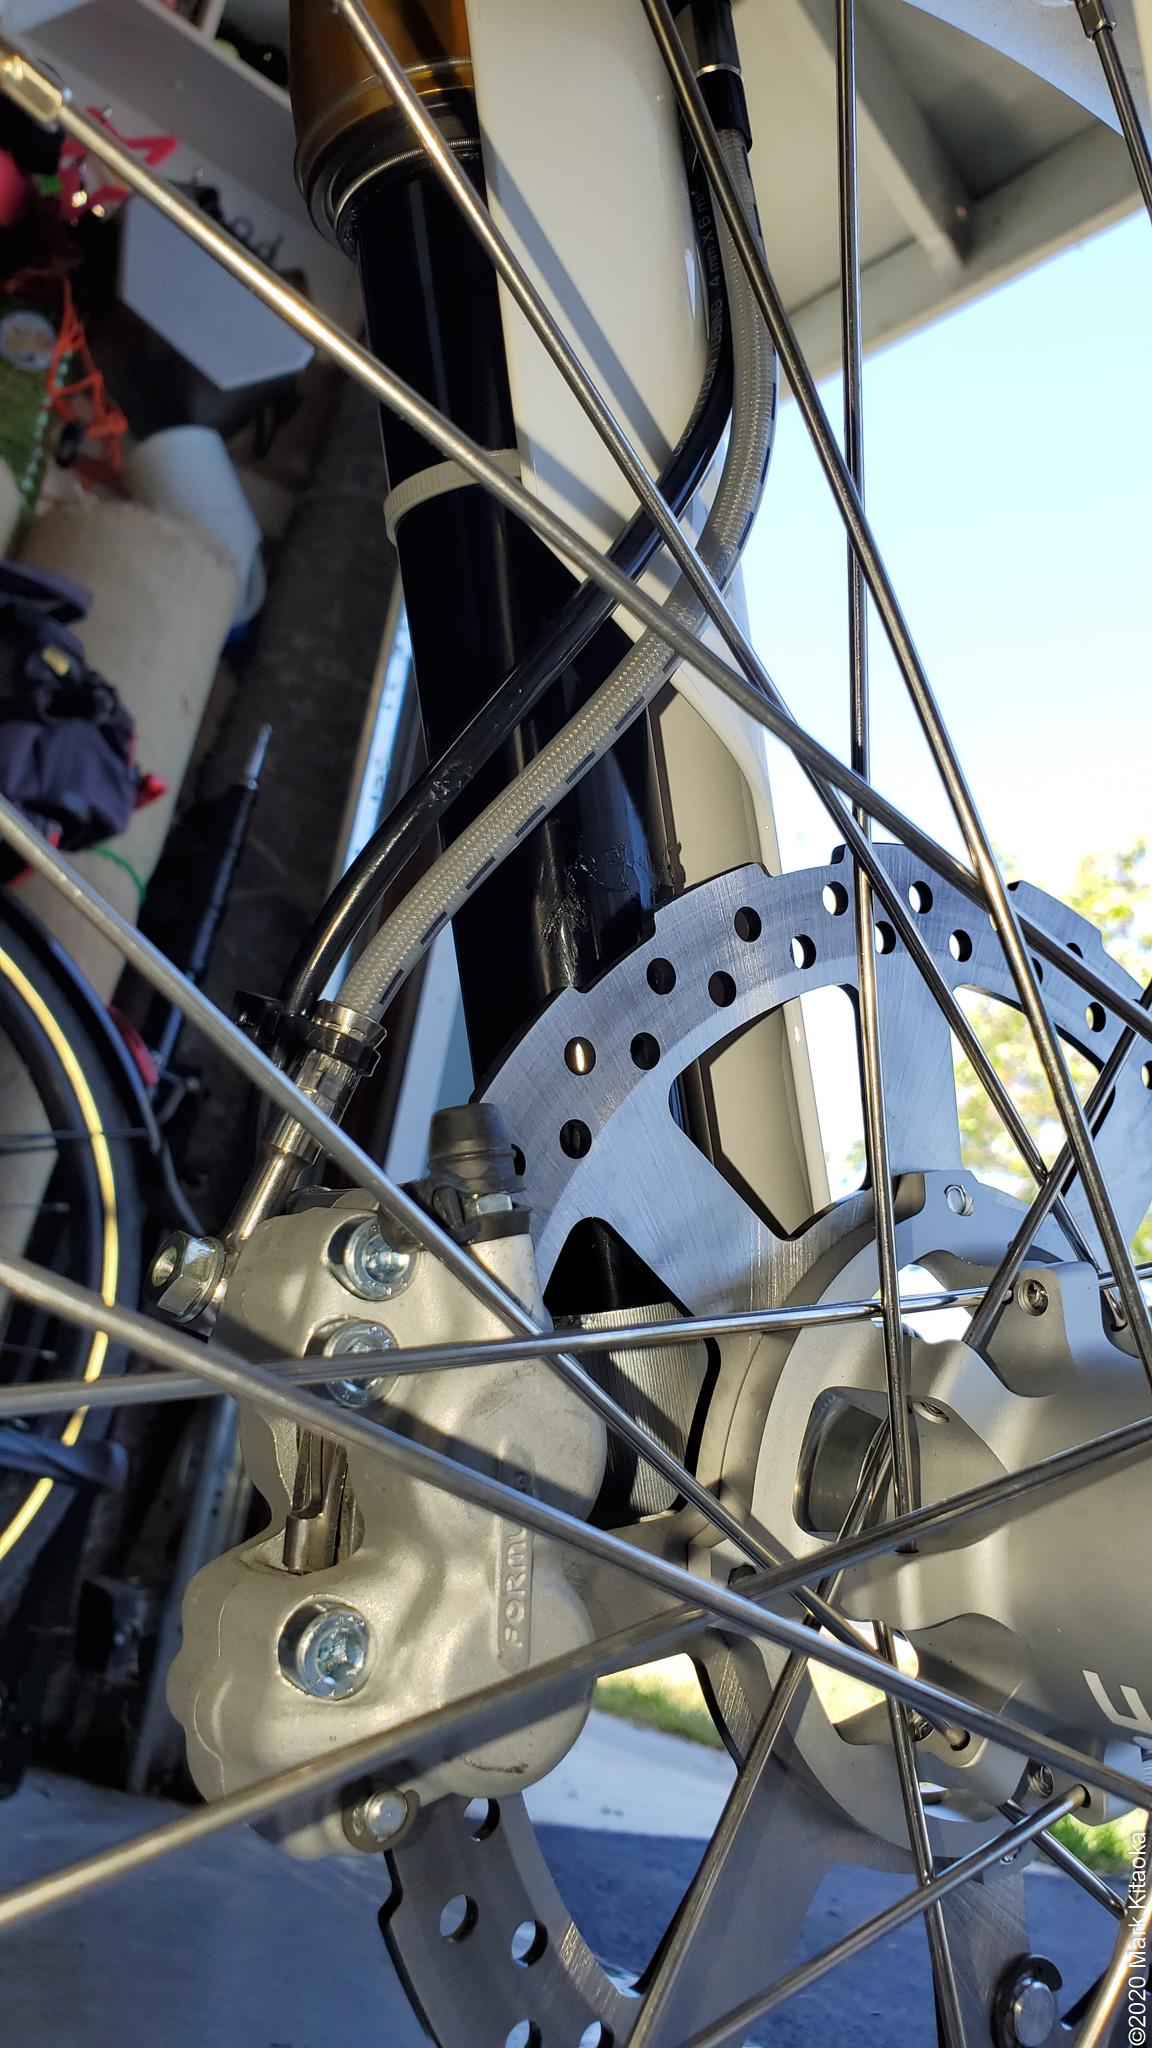 Closeup of Kalk spokes and brake disc